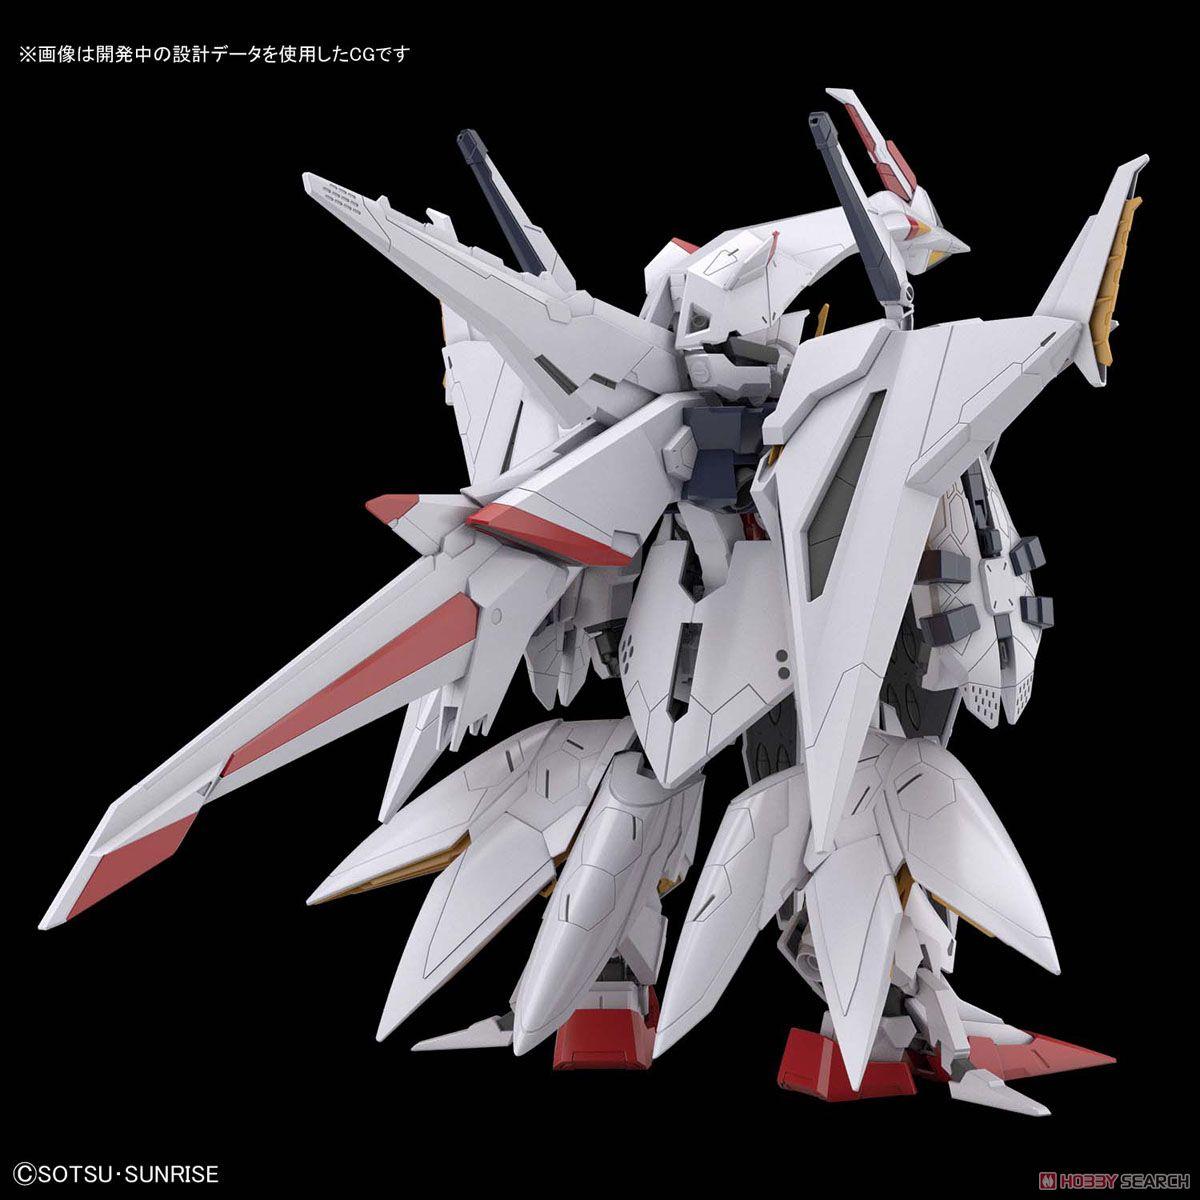 HGUC 1/144『ペーネロペー』機動戦士ガンダム 閃光のハサウェイ プラモデル-016